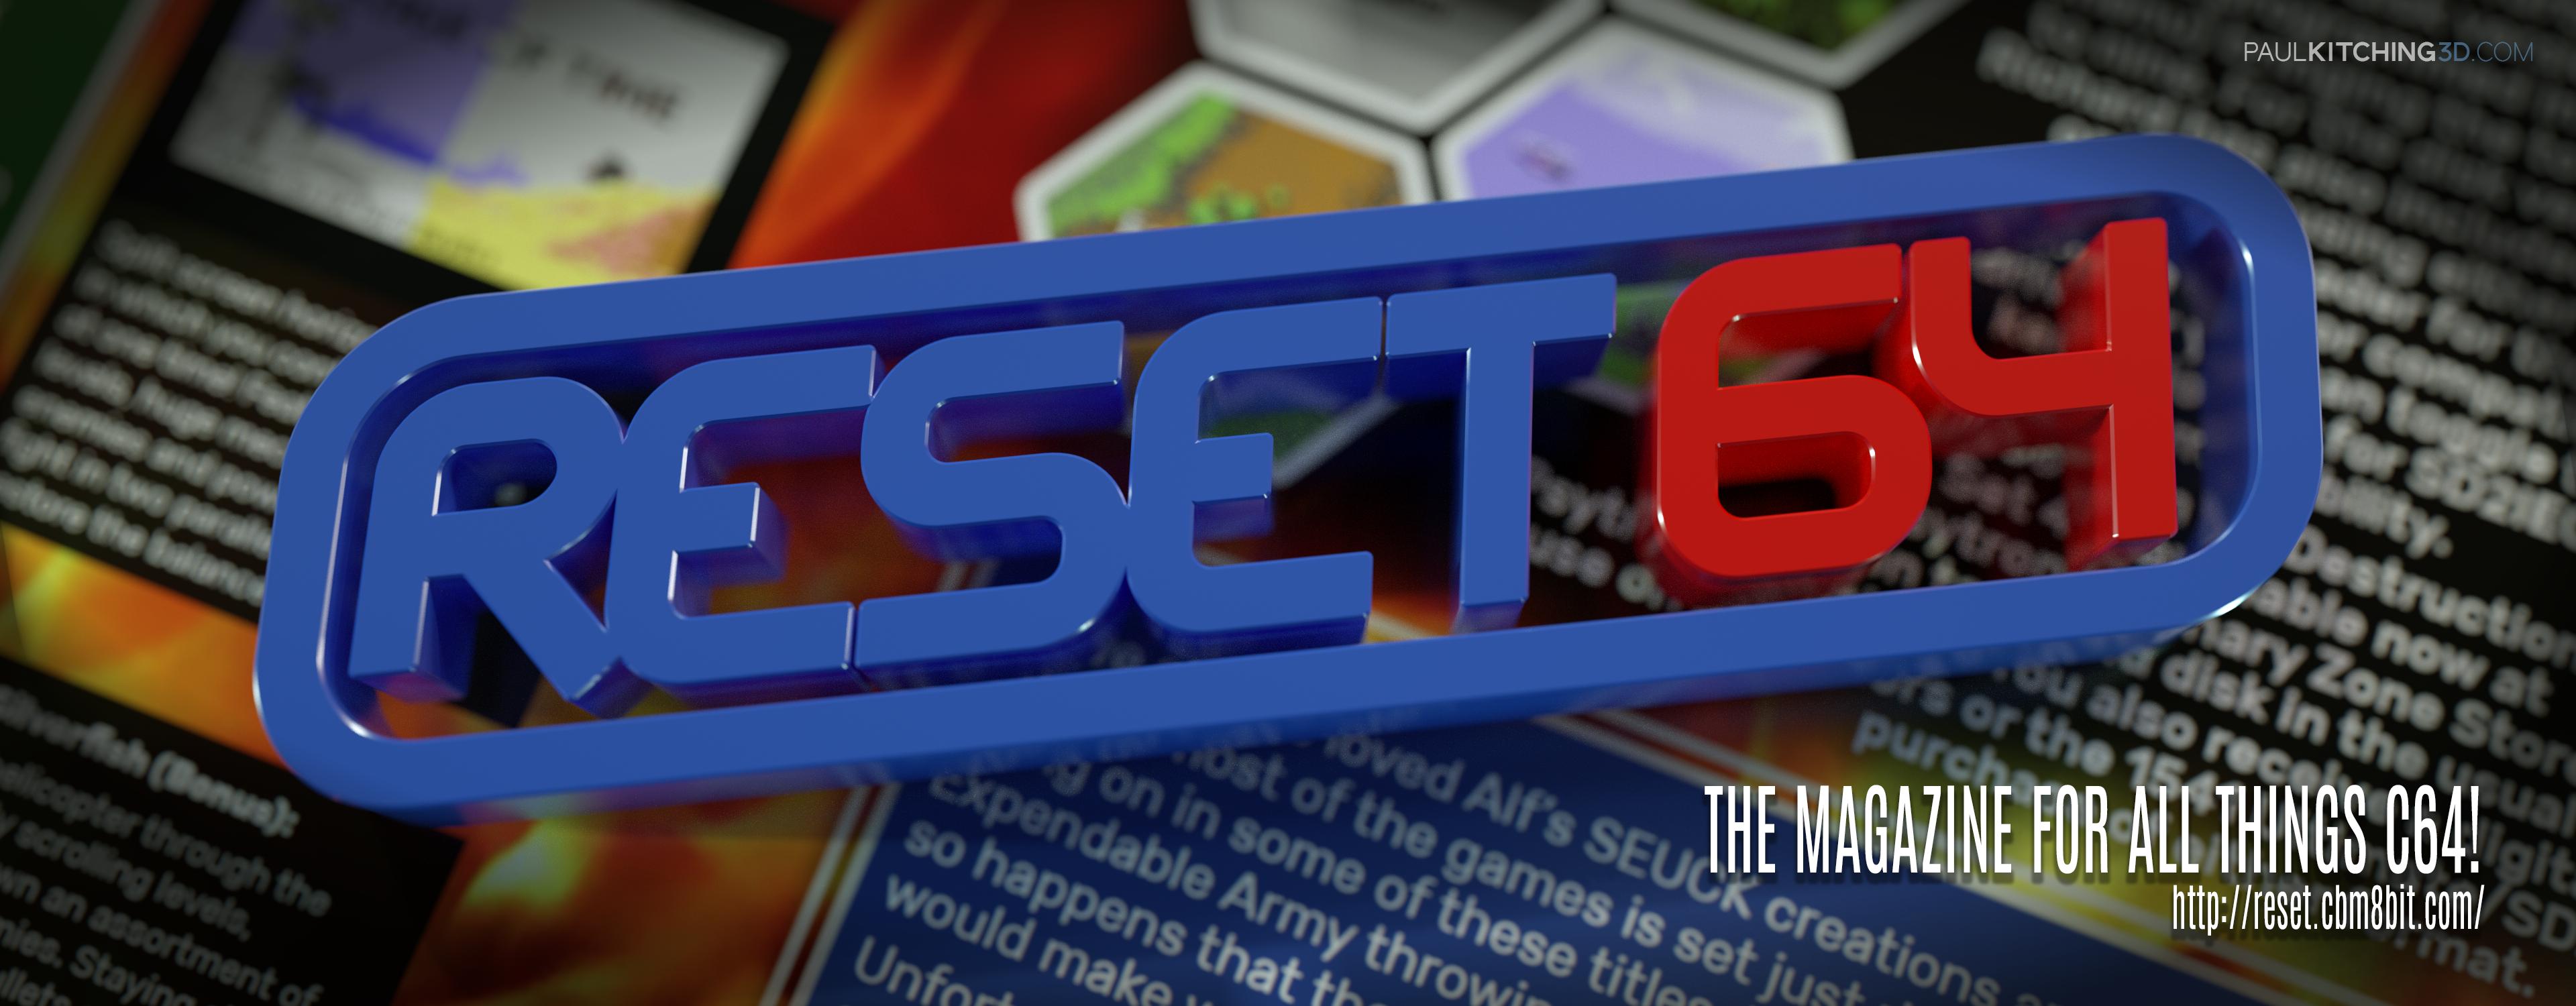 Reset #07 - July 2015